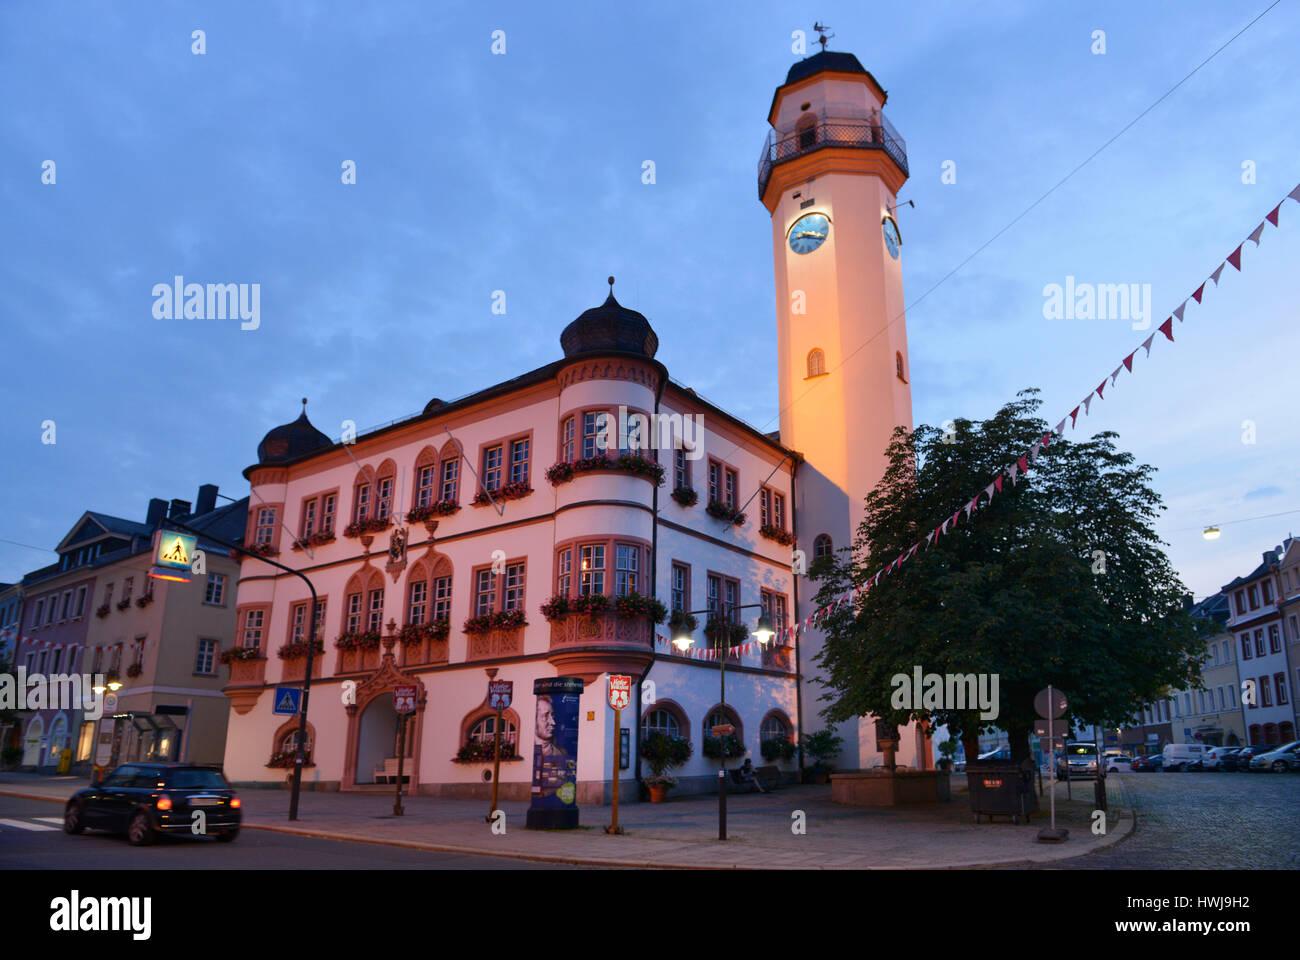 Hotel St Ludwig Munchen